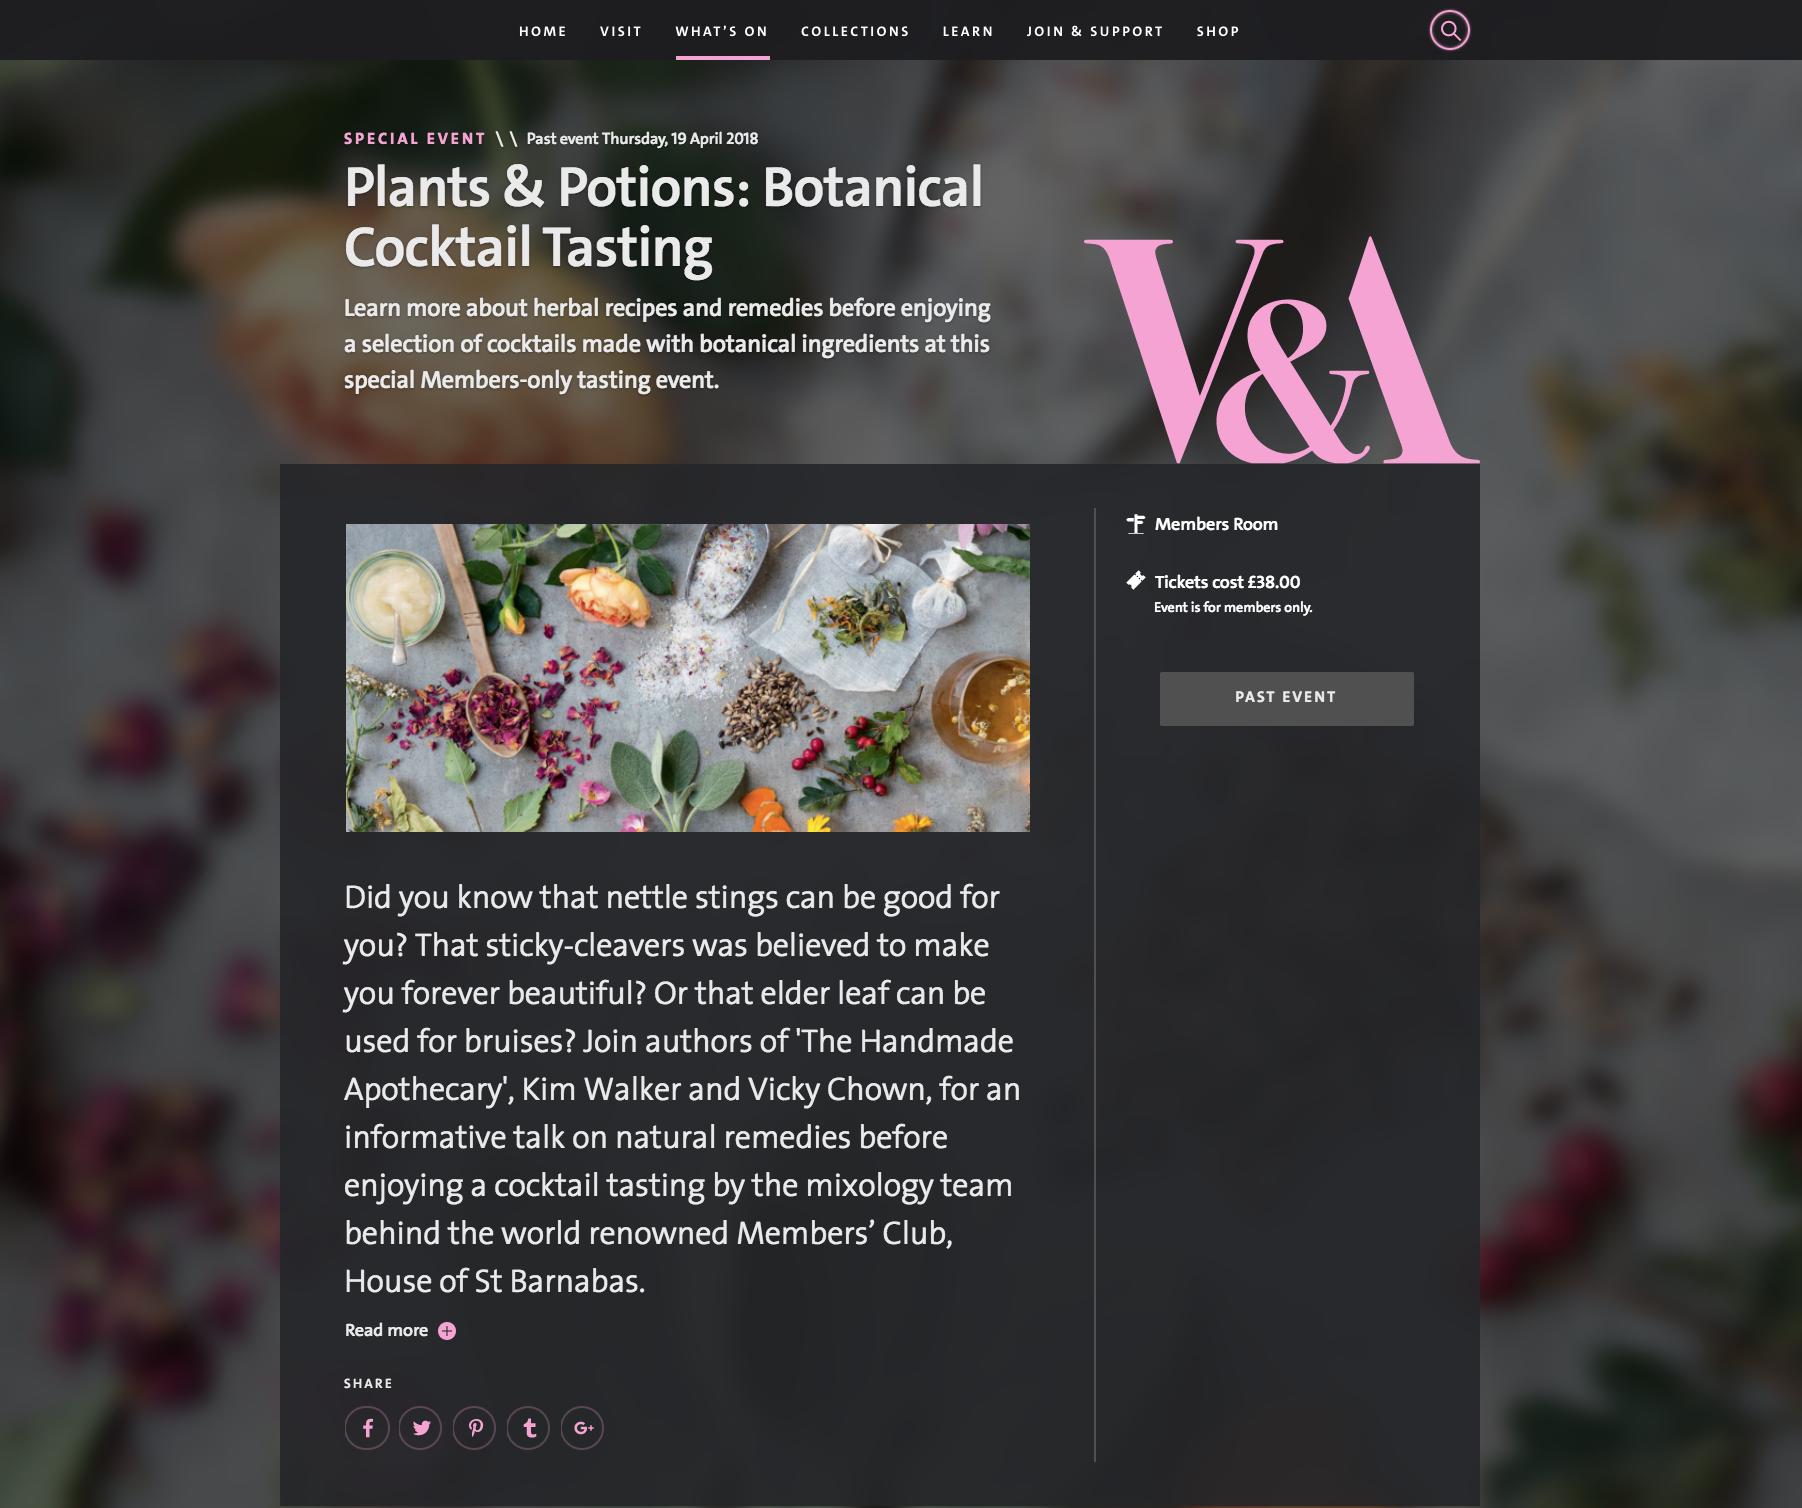 Victoria & Albert Museum Plants & Potions Botanical Cocktail Tasting 19/04/18